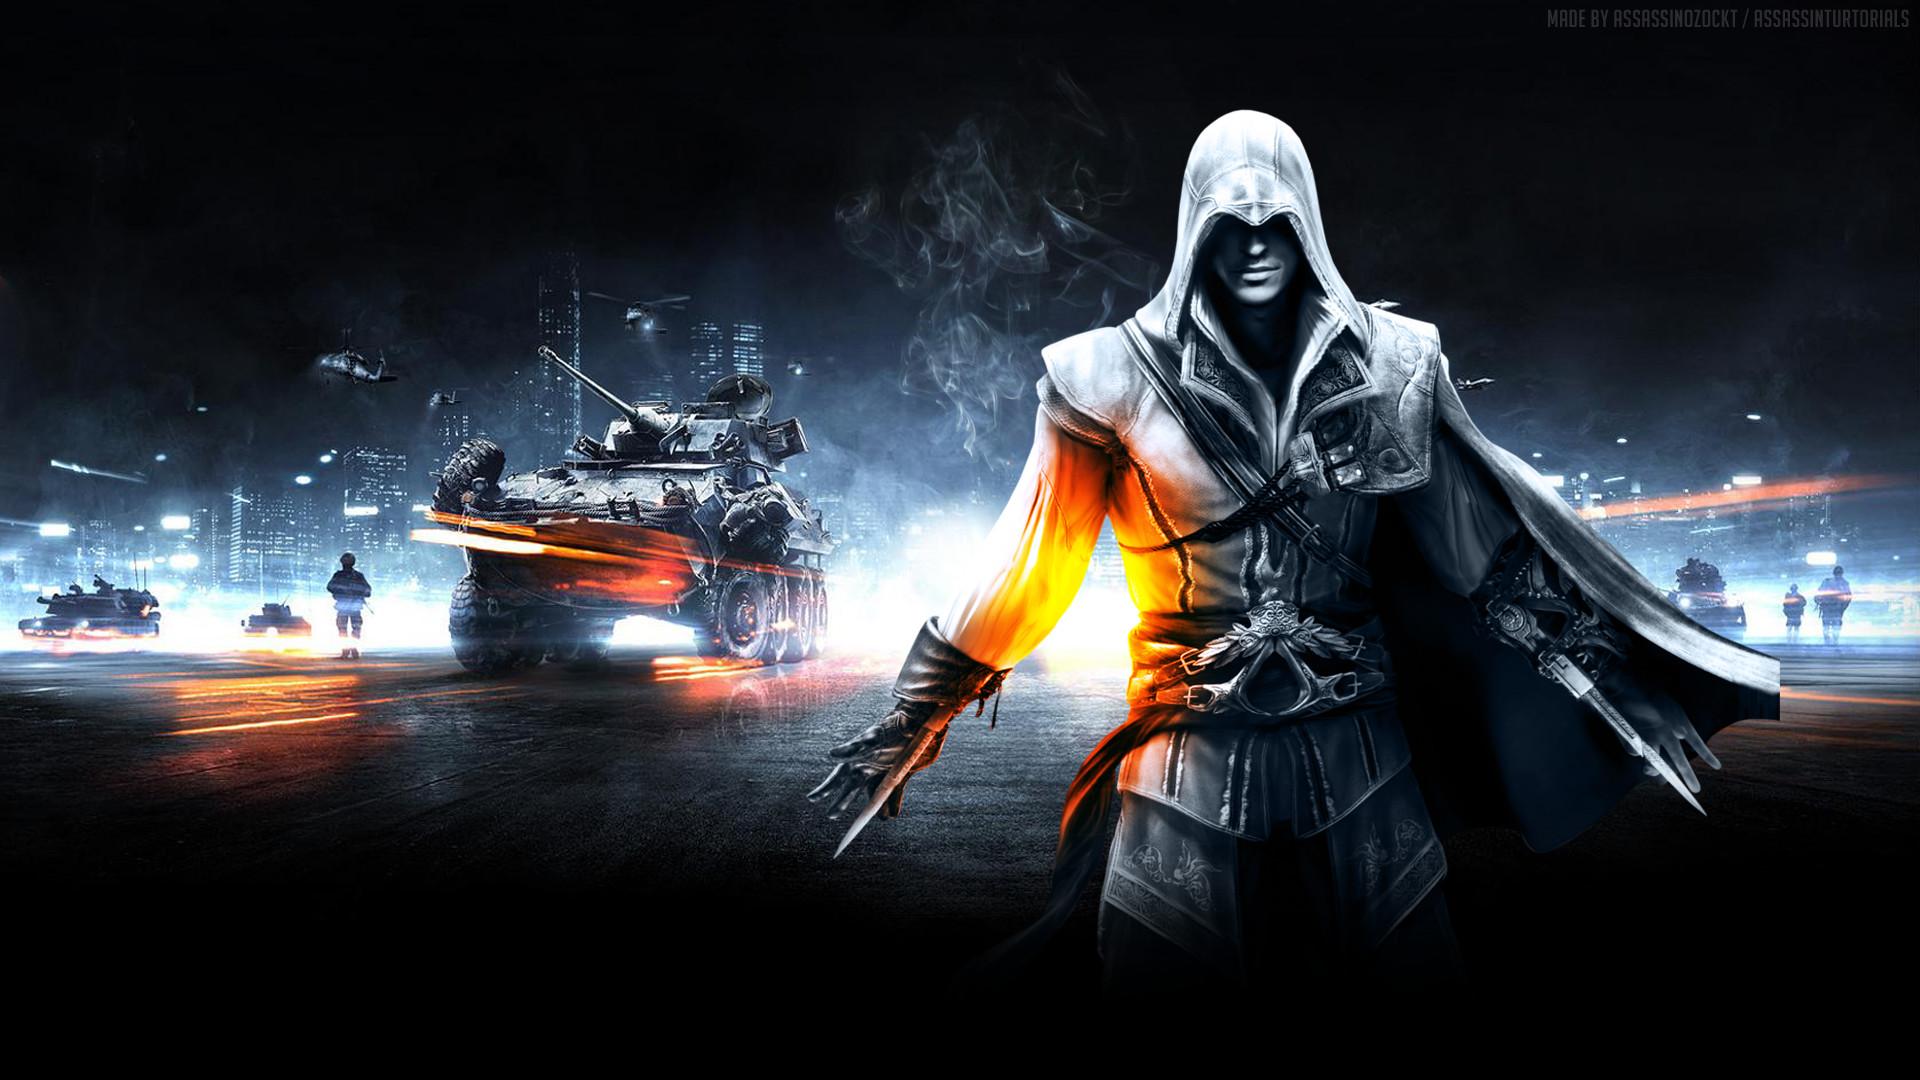 Video game wallpaper | Video Game – Collage – Assassins Creed – Battlefield  Wallpaper